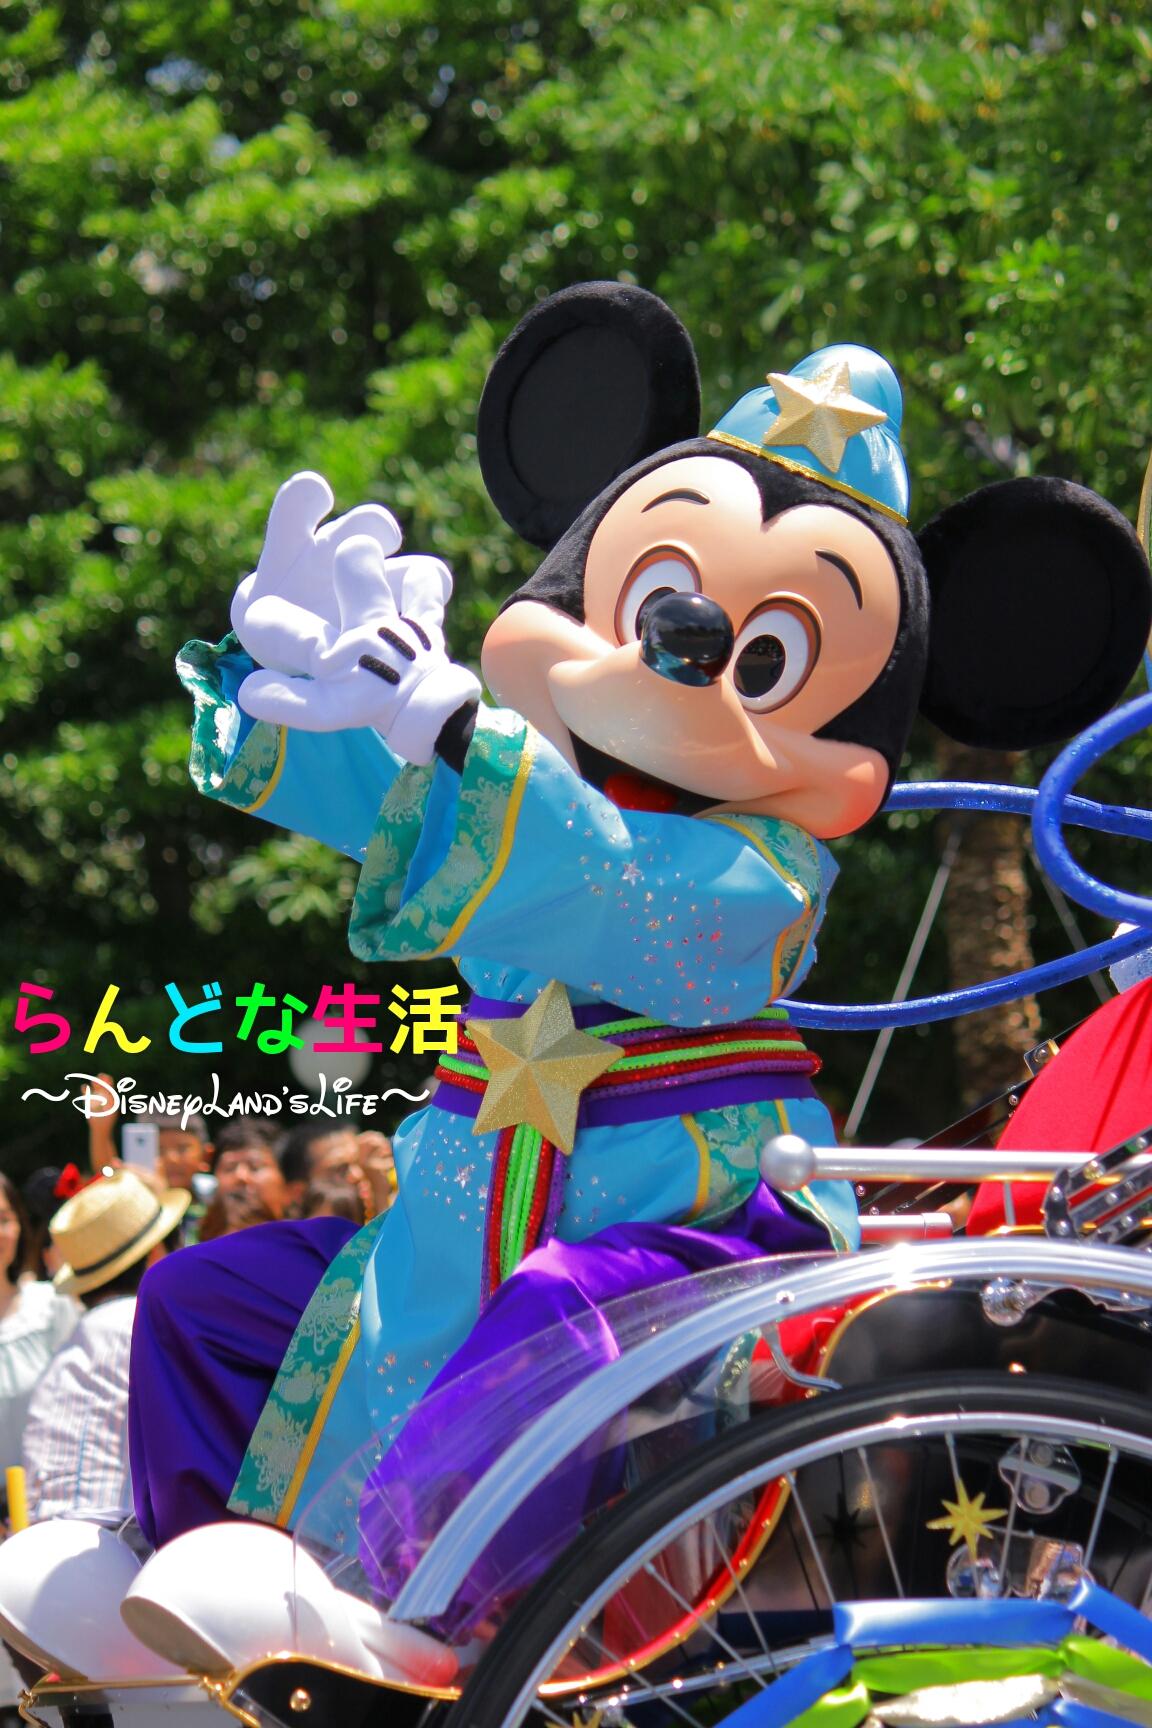 tanabata16_ミッキー006.jpg